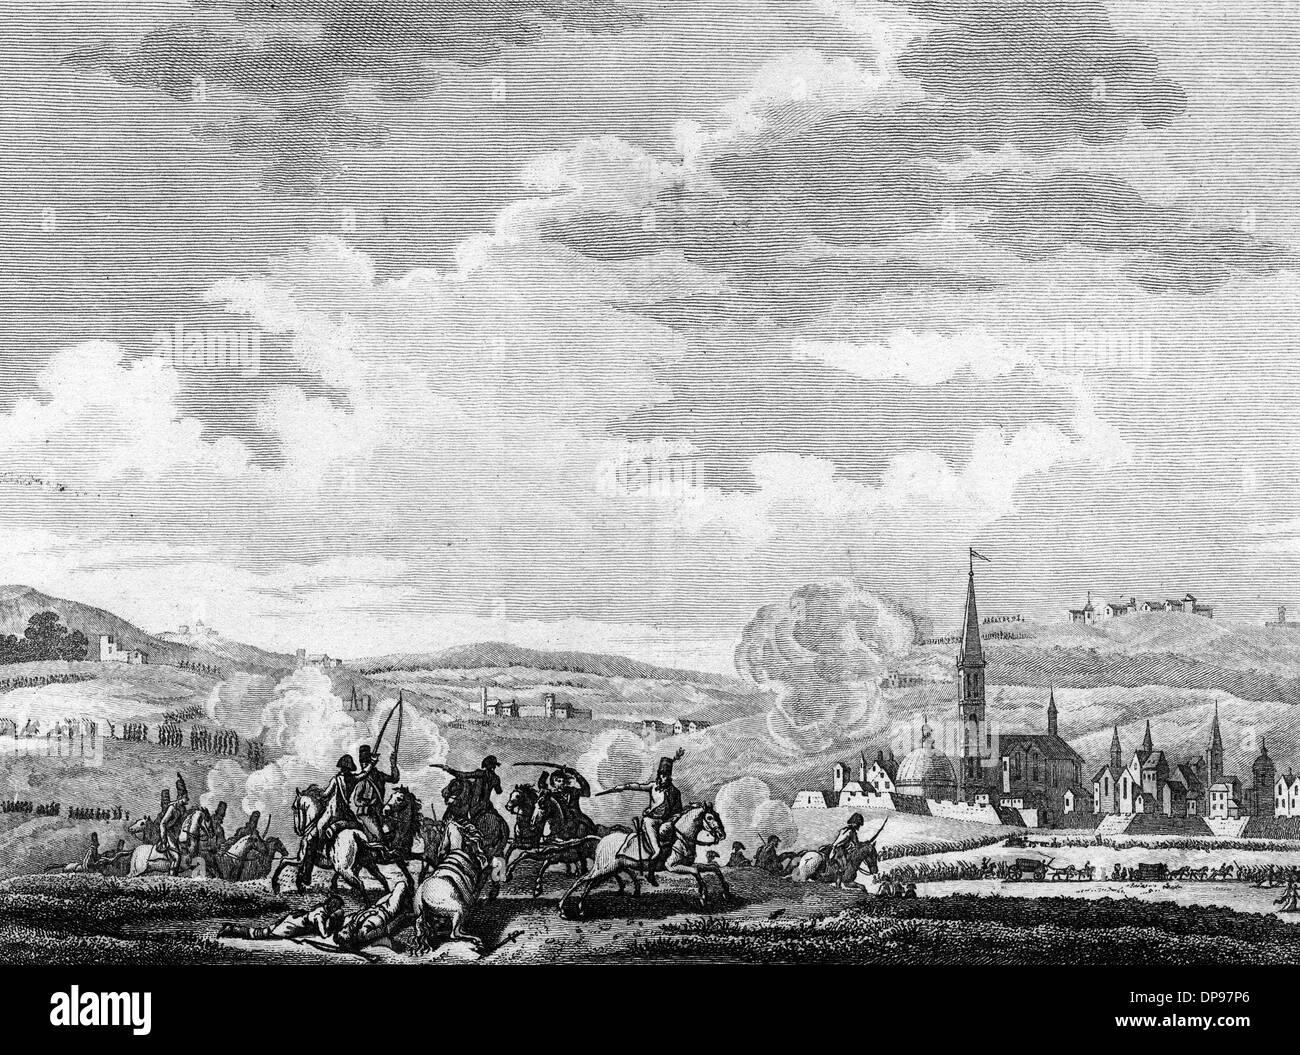 Battle of Neerwinden in the Revolutionary Wars, 1793 - Stock Image